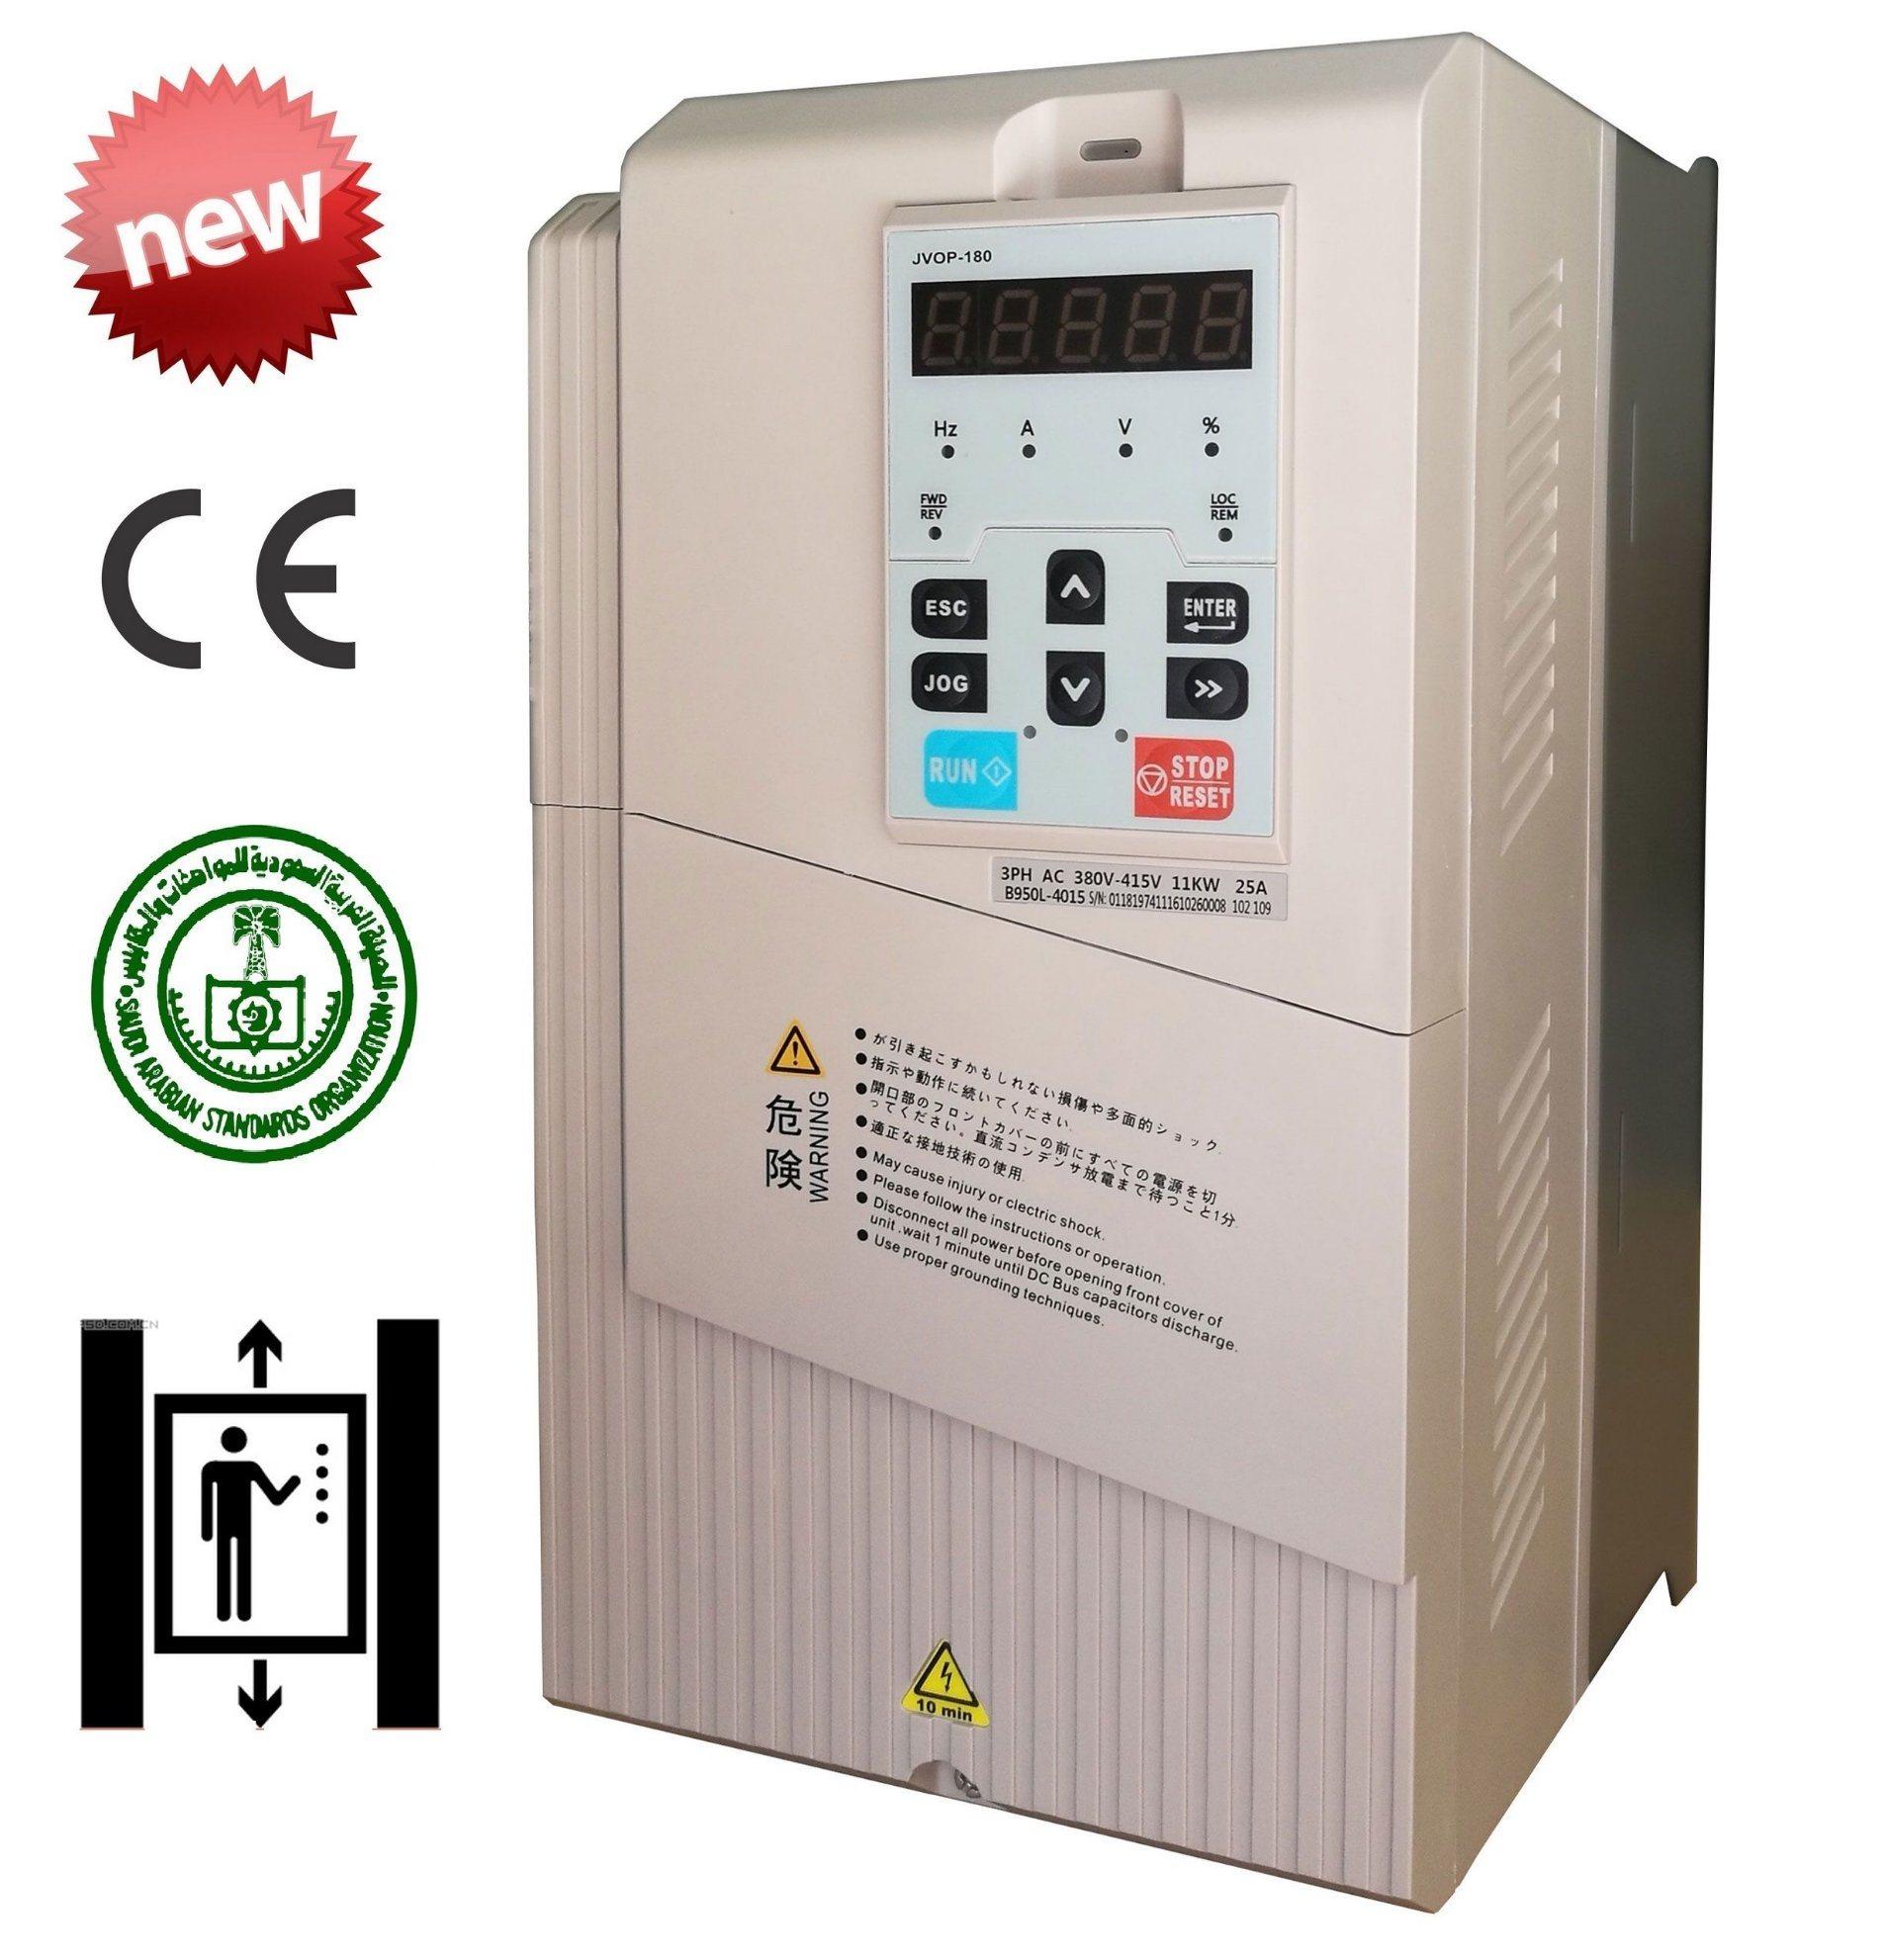 China B950l Lift Inverter Drive Danfoss Wiring Diagram Vlt Aqua